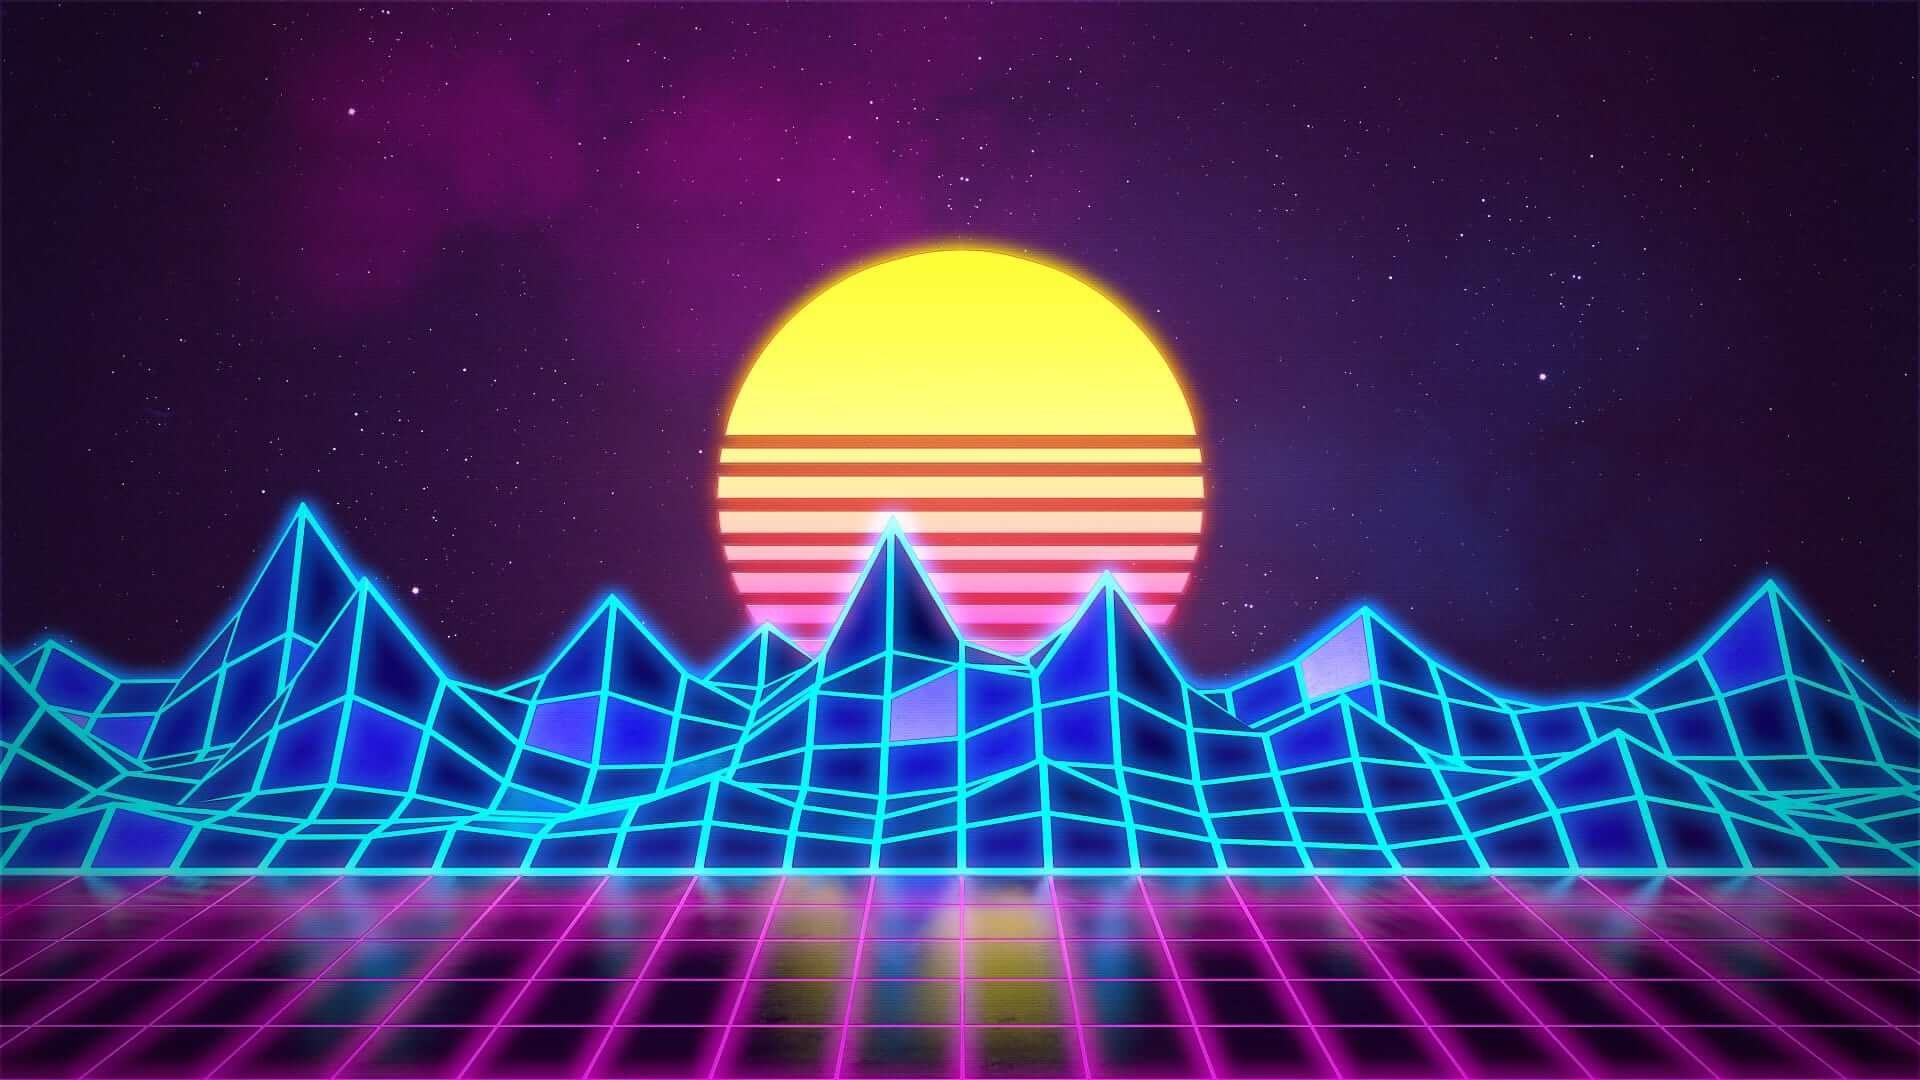 Retro Neon